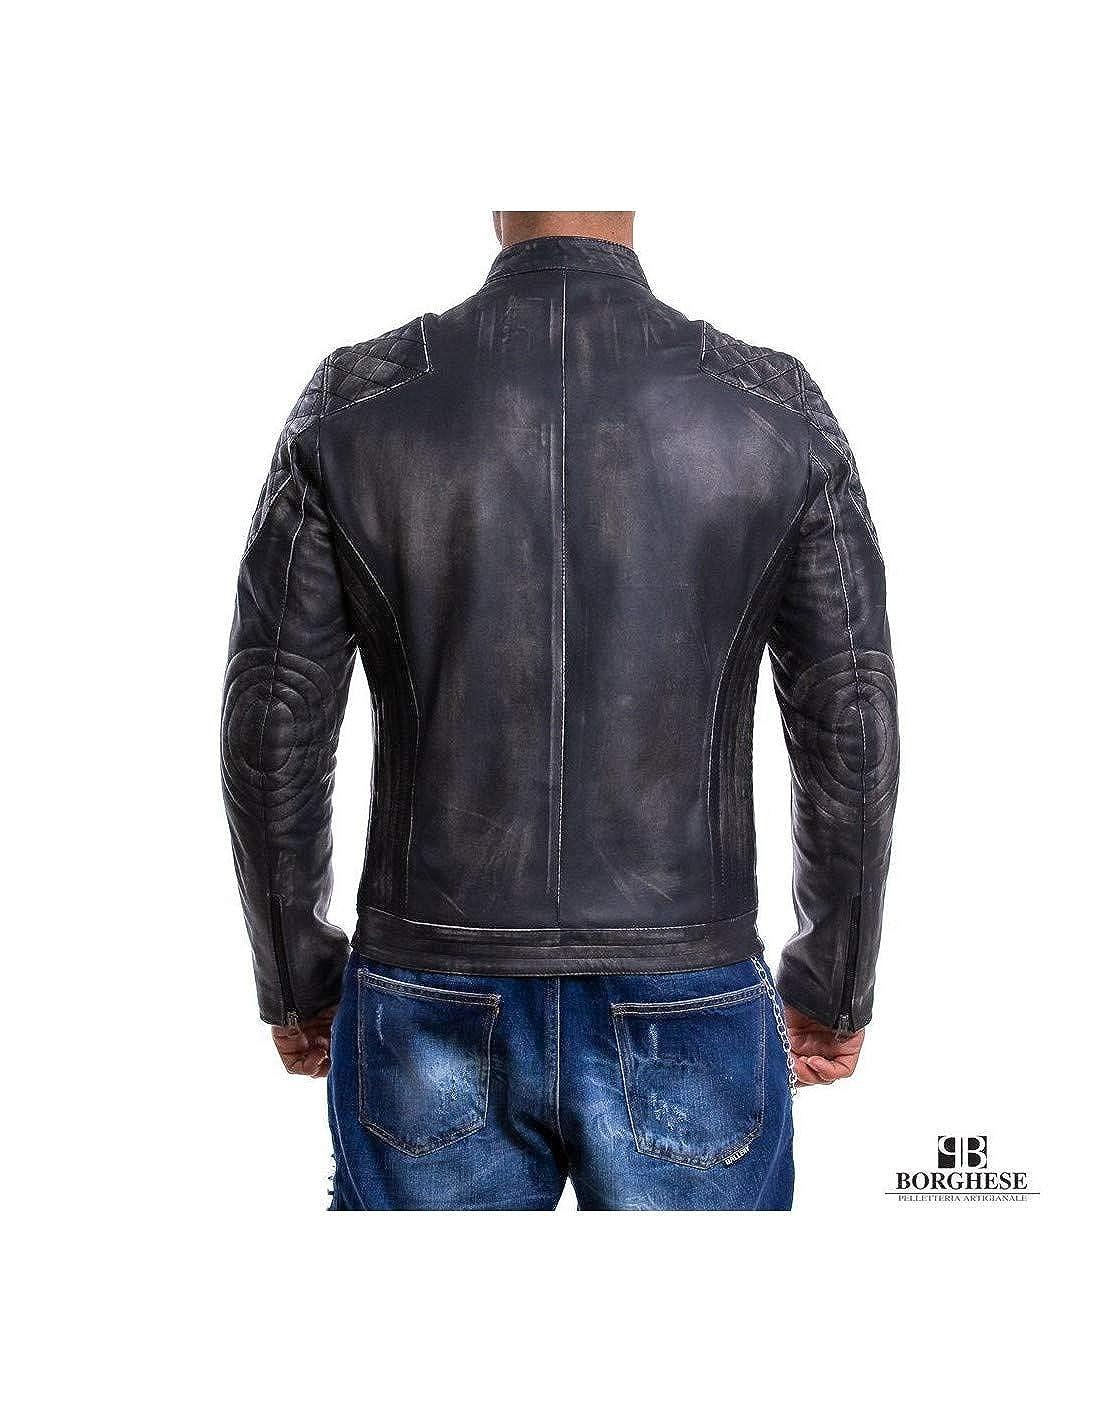 A244ASPG Giacca in pelle moto motociclista vera pelle vintage grigio